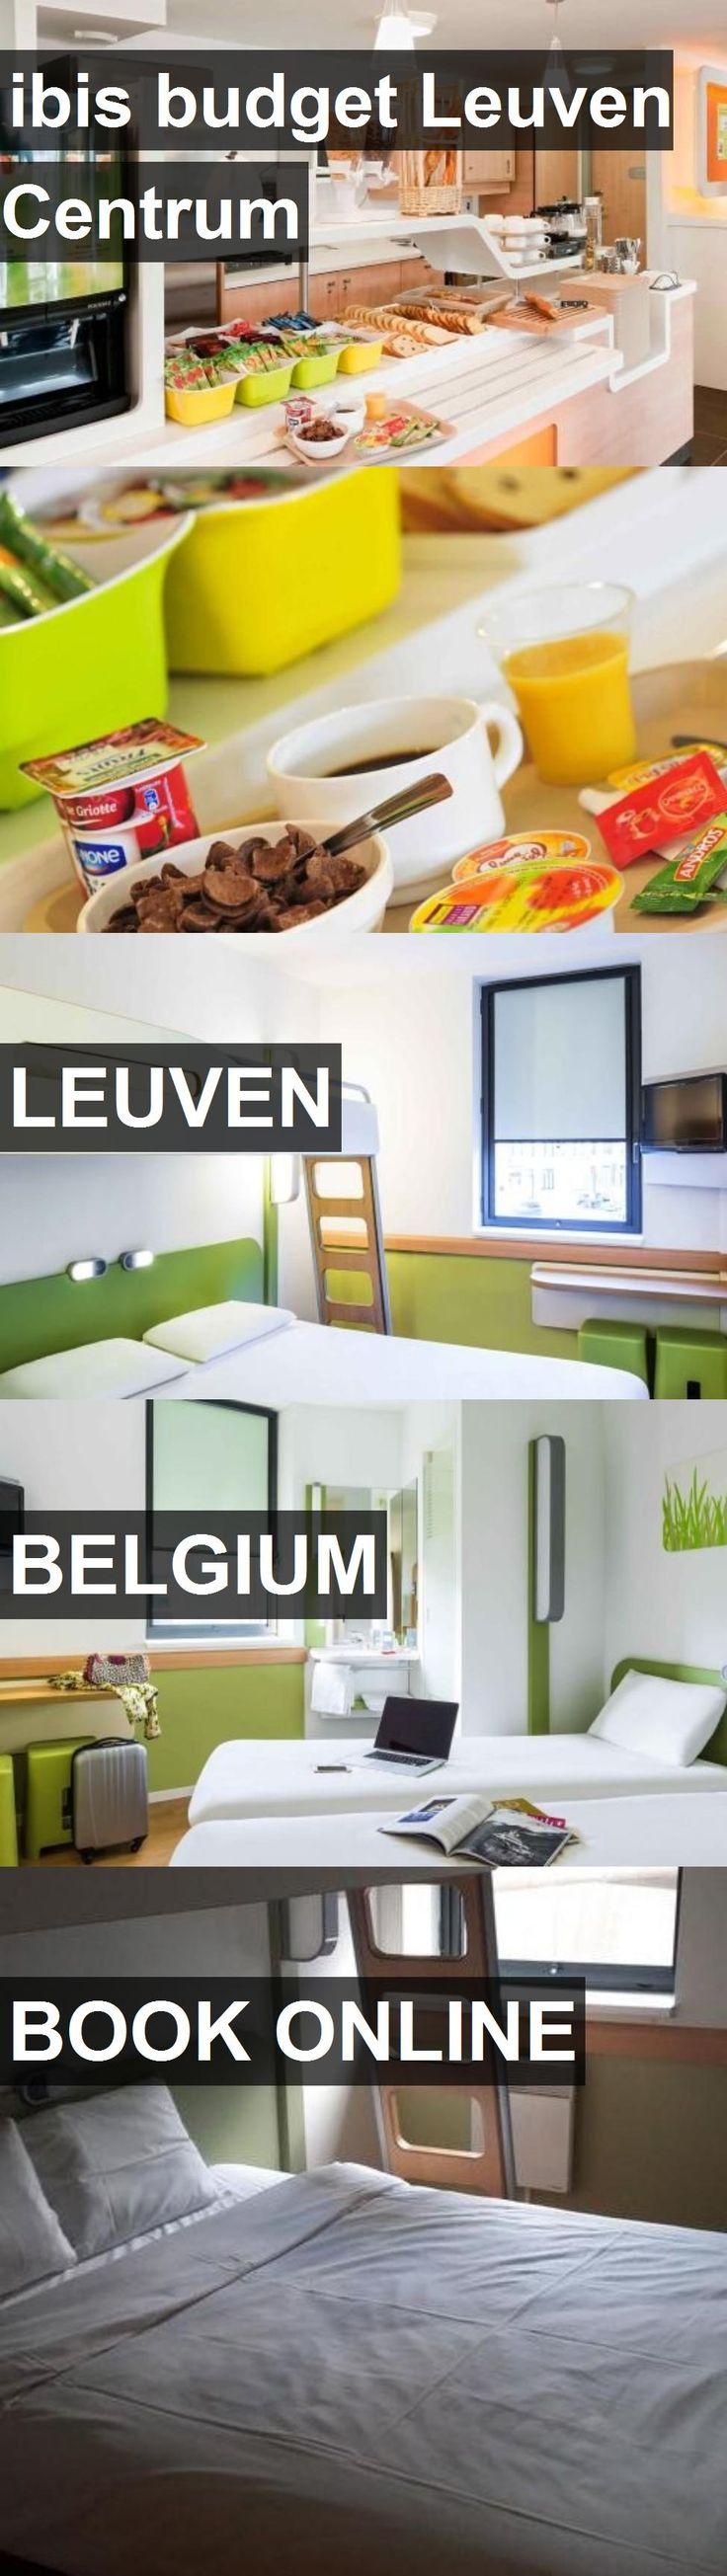 Hotel ibis budget Leuven Centrum in LEUVEN, Belgium. For more information, photos, reviews and best prices please follow the link. #Belgium #LEUVEN #travel #vacation #hotel